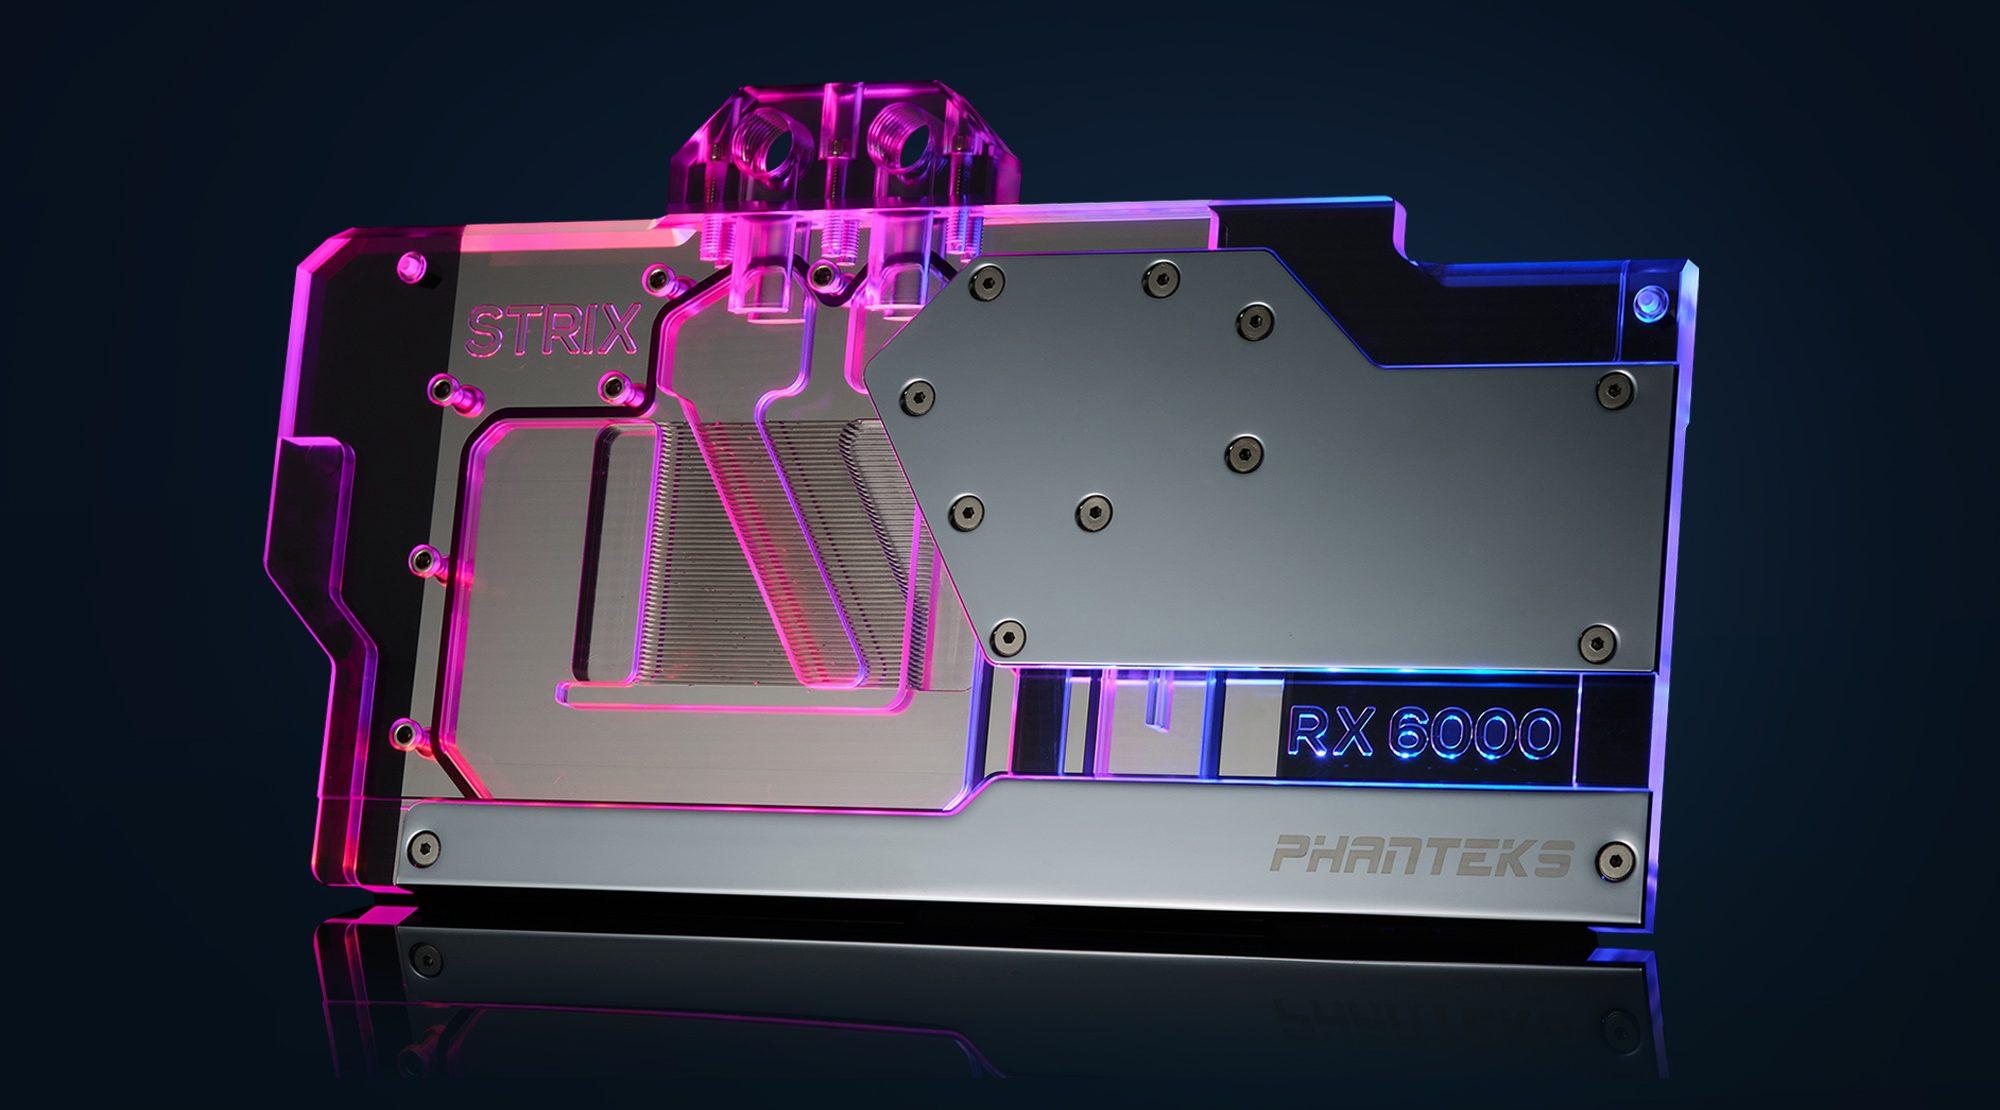 Phanteks announces Glacier G6000 water block for ASUS Radeon RX 6800/6900 TUF and STRIX cards – VideoCardz.com